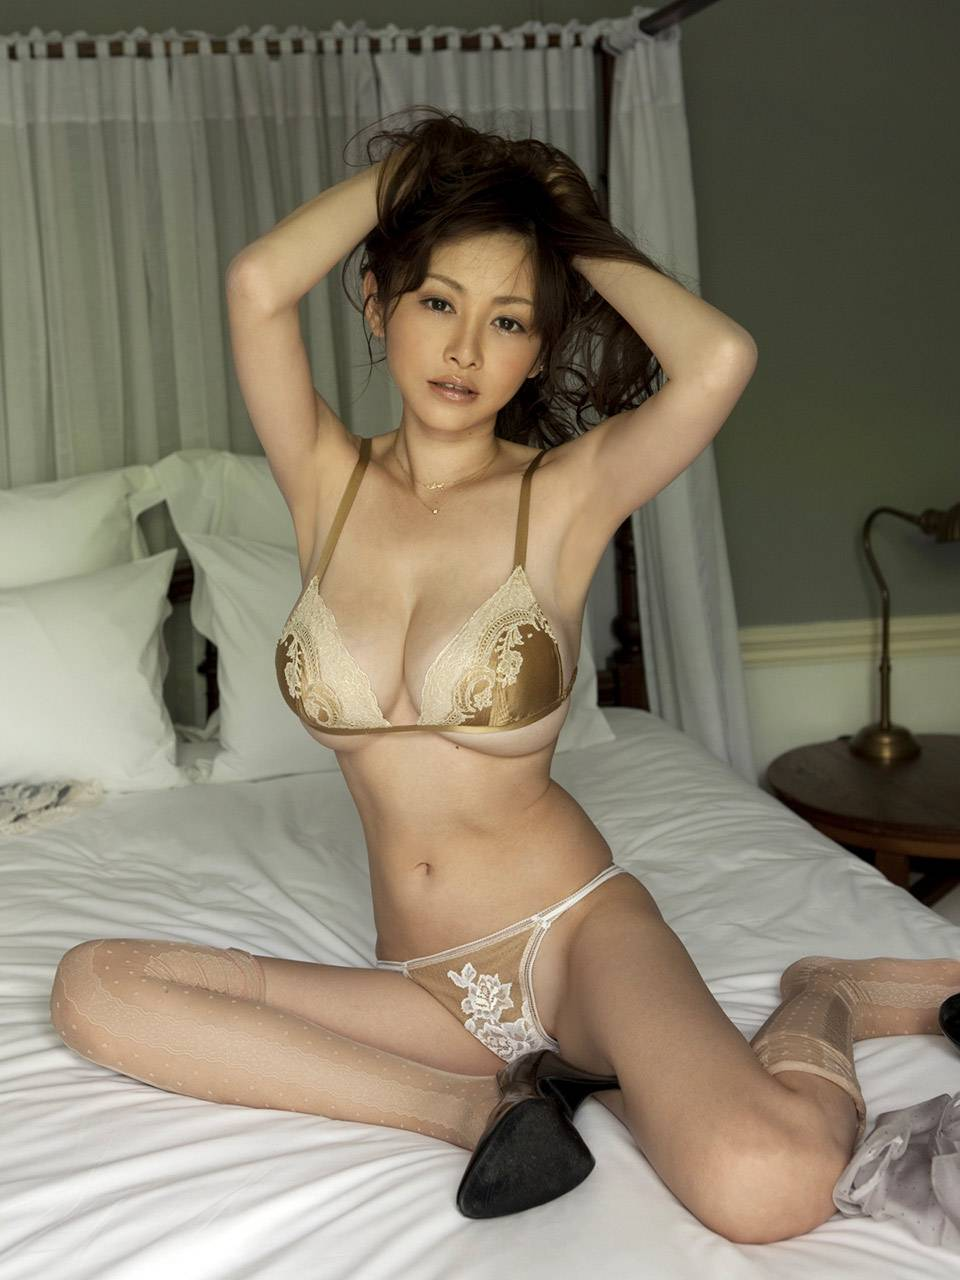 Phim cấp người đẹp Jessica Kizaki,phim xxx 18+ Nhật Bản